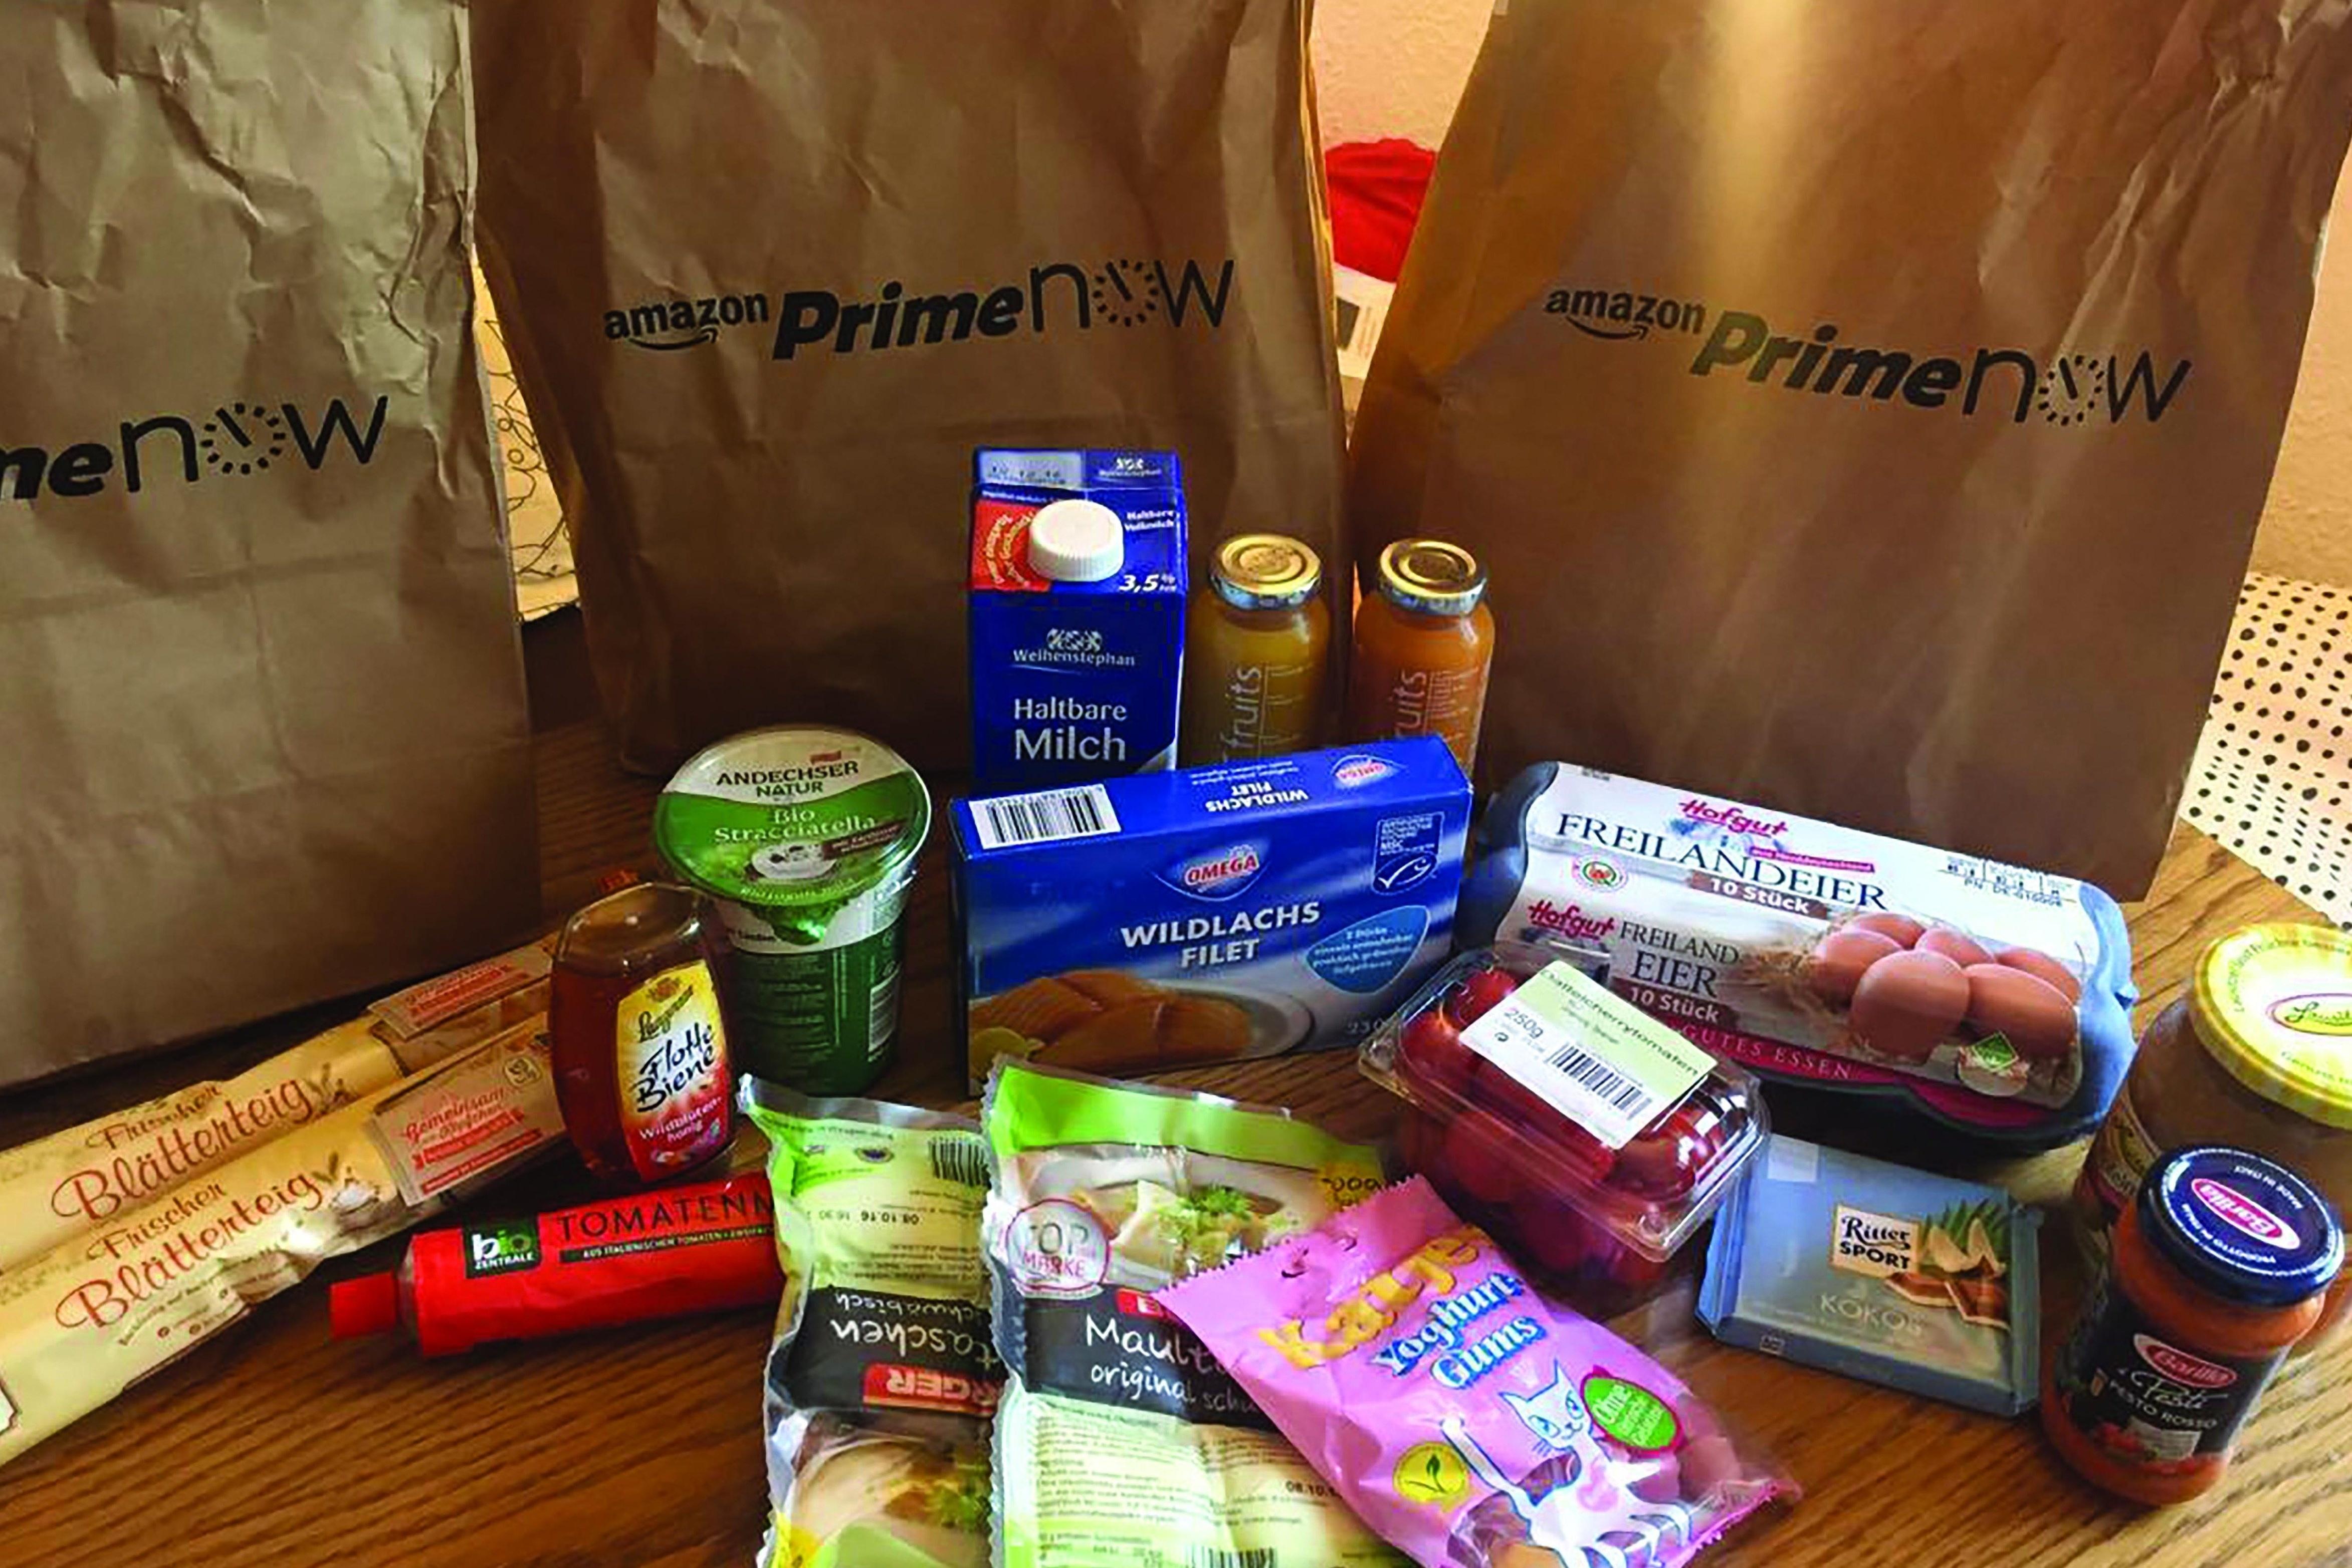 Amazon prime now-693619-edited-992989-edited